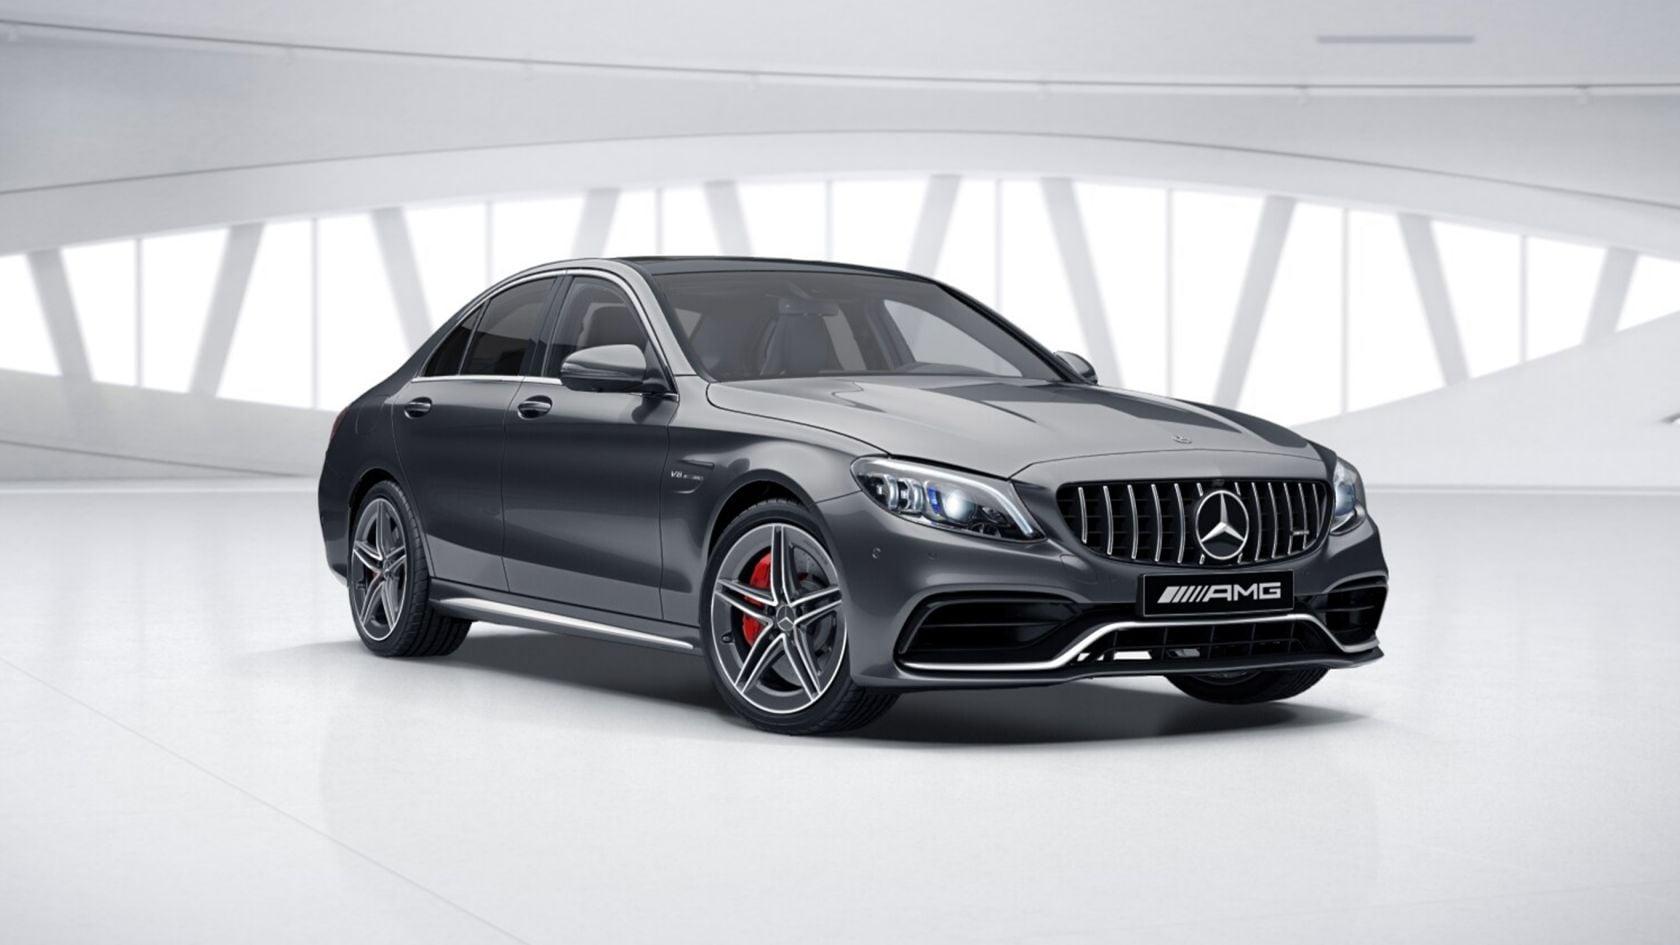 Mercedes Benz C Class Saloon Models And Equipment